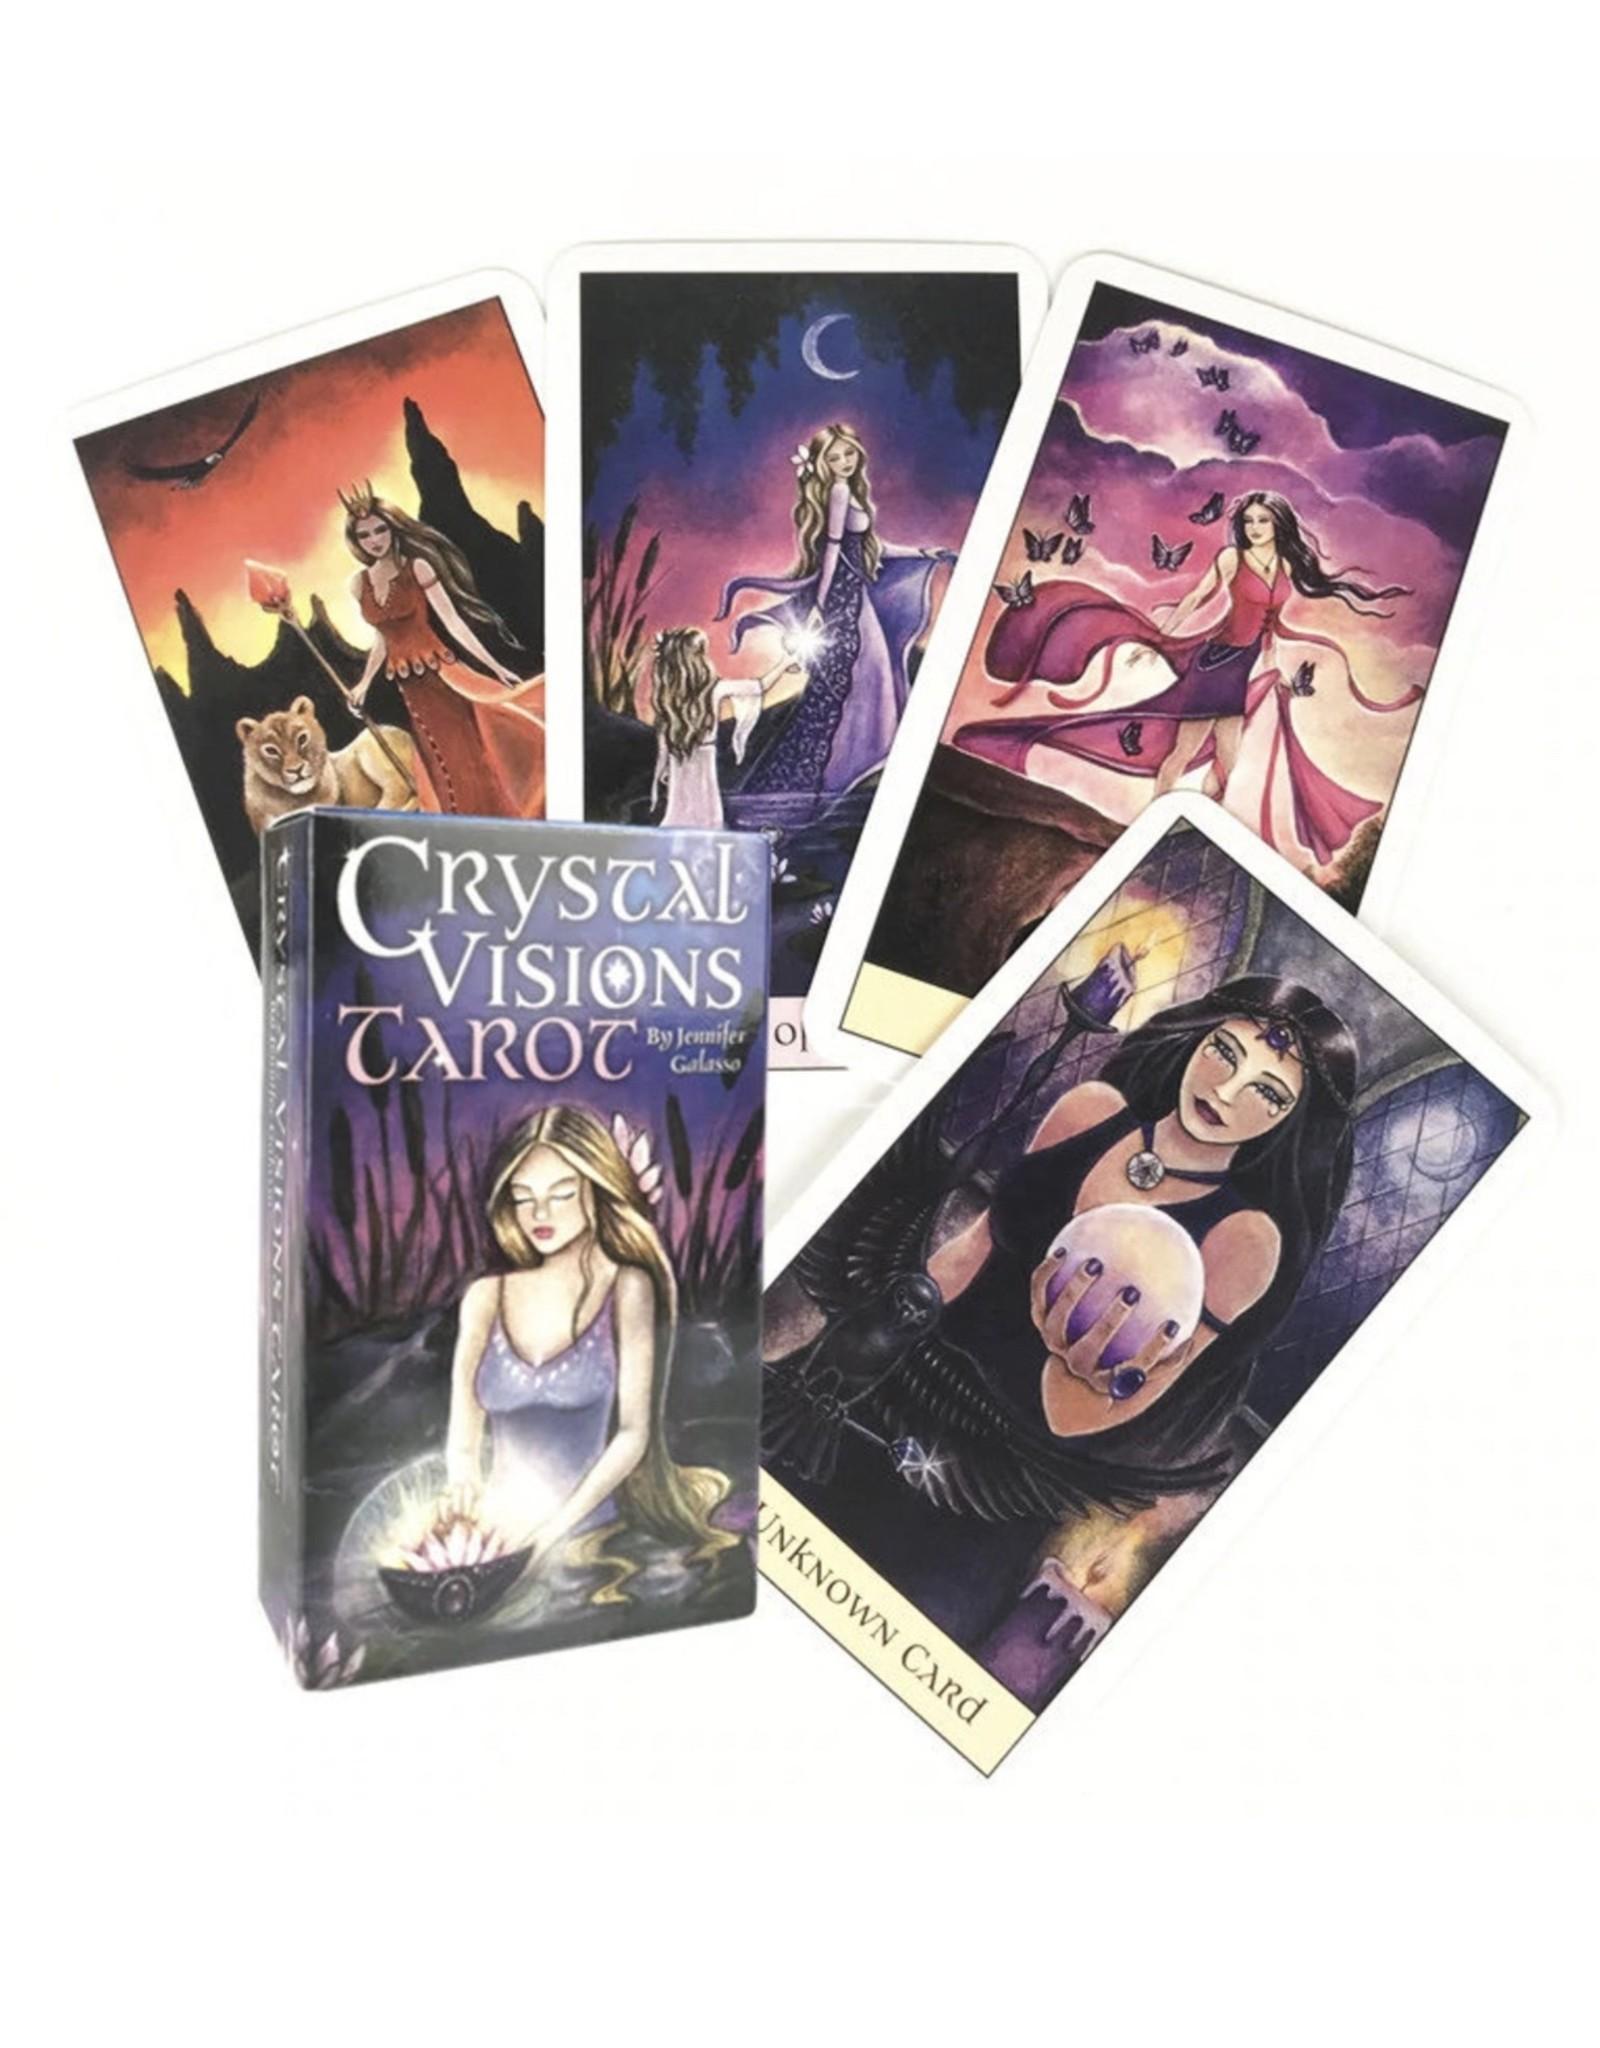 Crystal Visions Tarot-Digital Guidebook